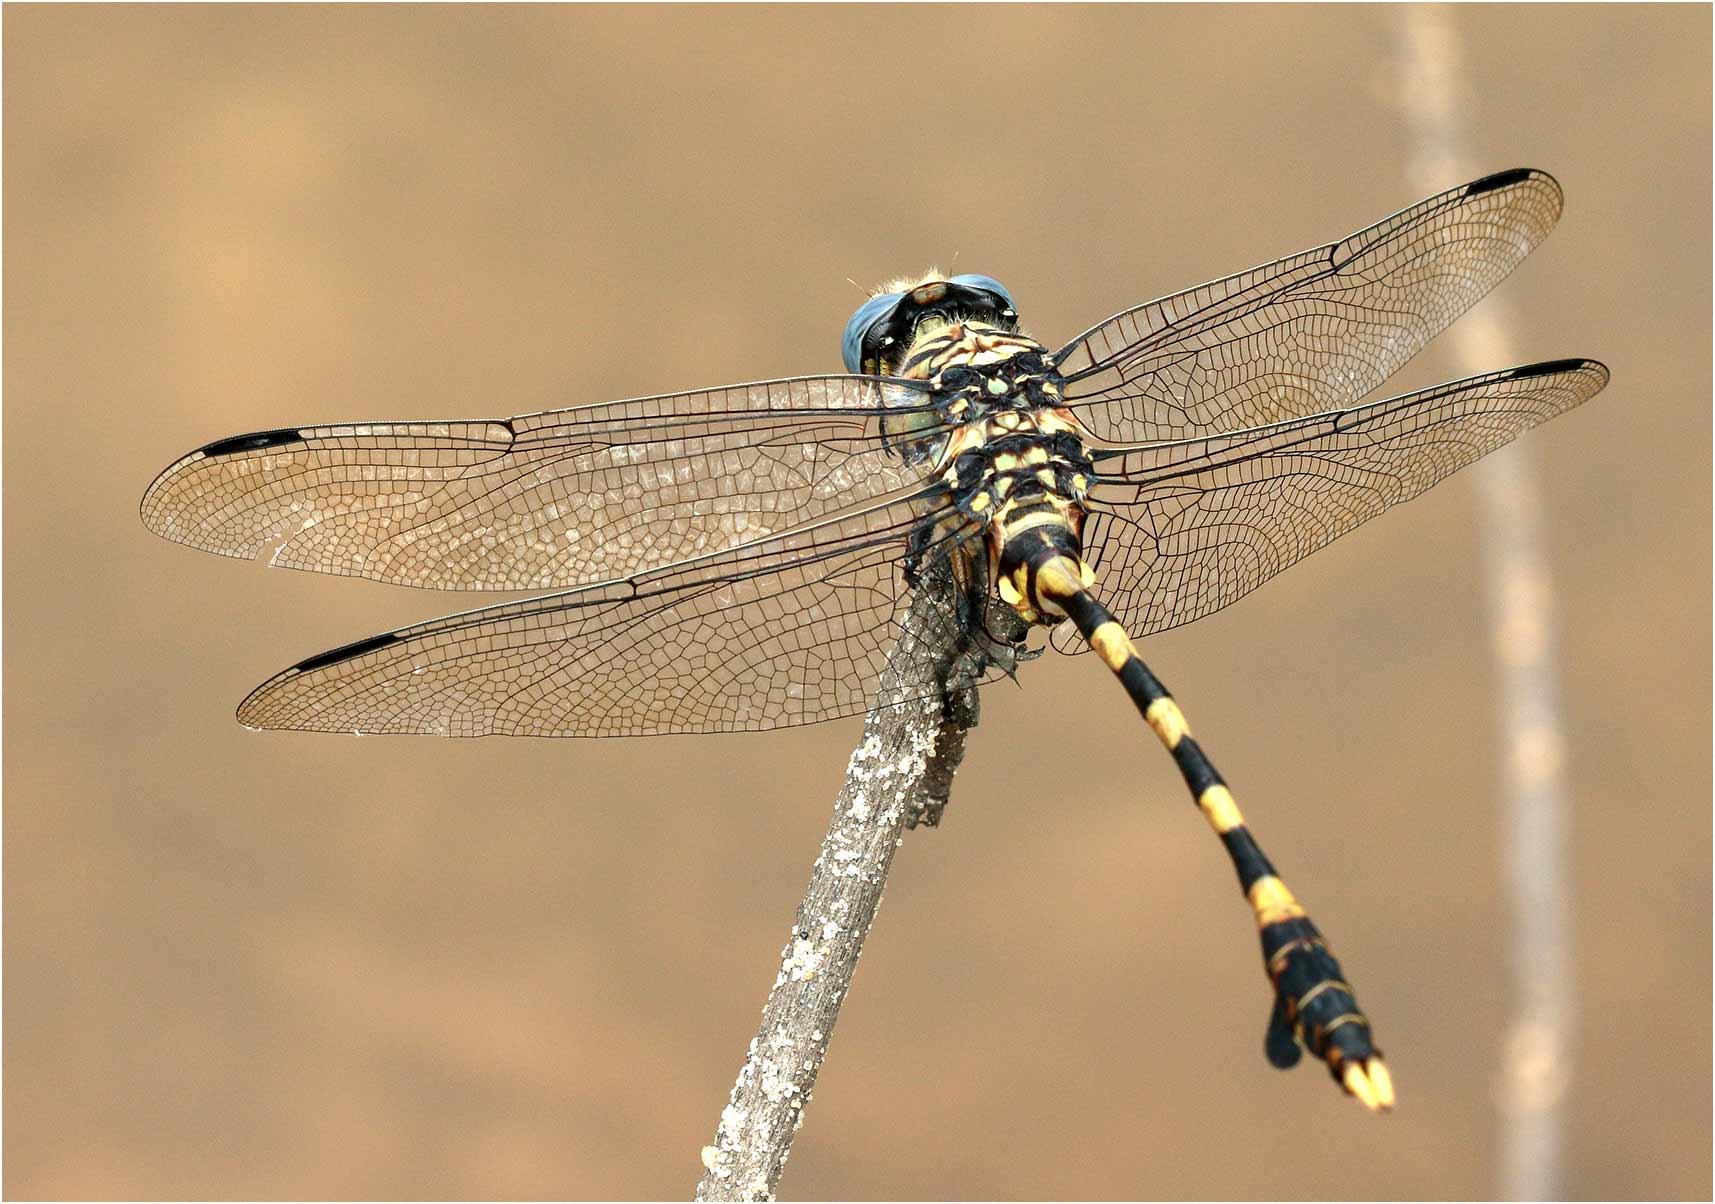 Ictinogomphus ferox mâle, Namibie, Katima Mulilo, 15/02/2020